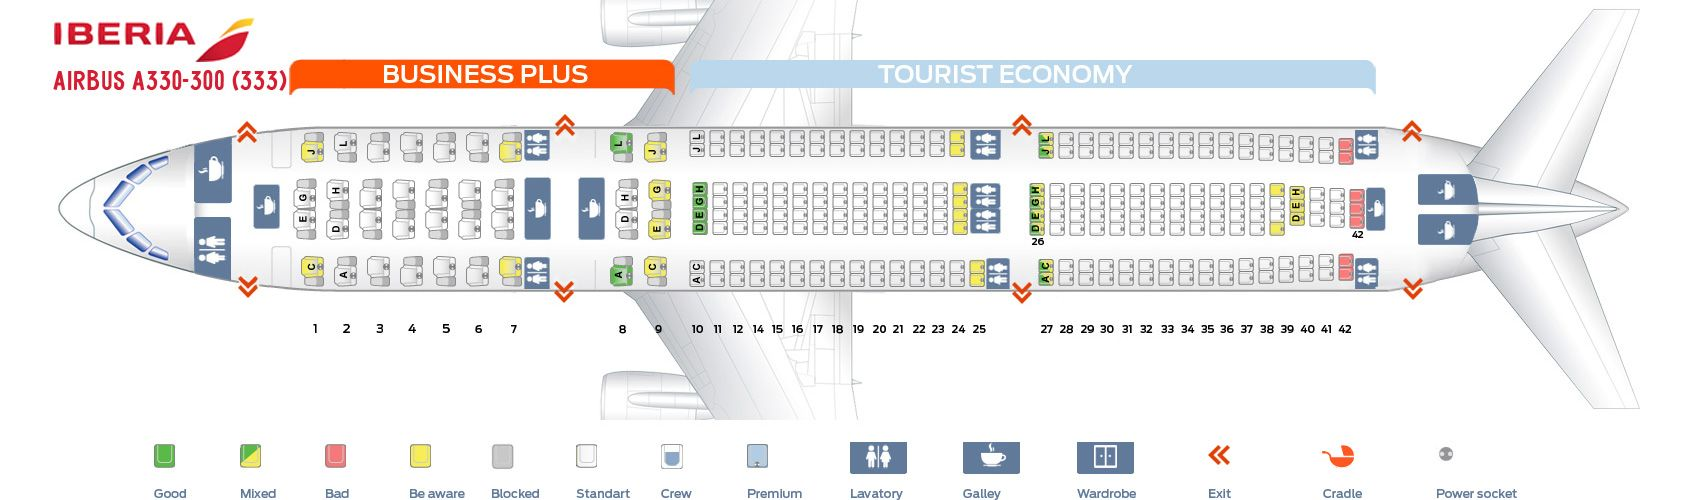 airbus a330 200 seat map Iberia Fleet Airbus A330 300 Details And Pictures Airbus A330 airbus a330 200 seat map